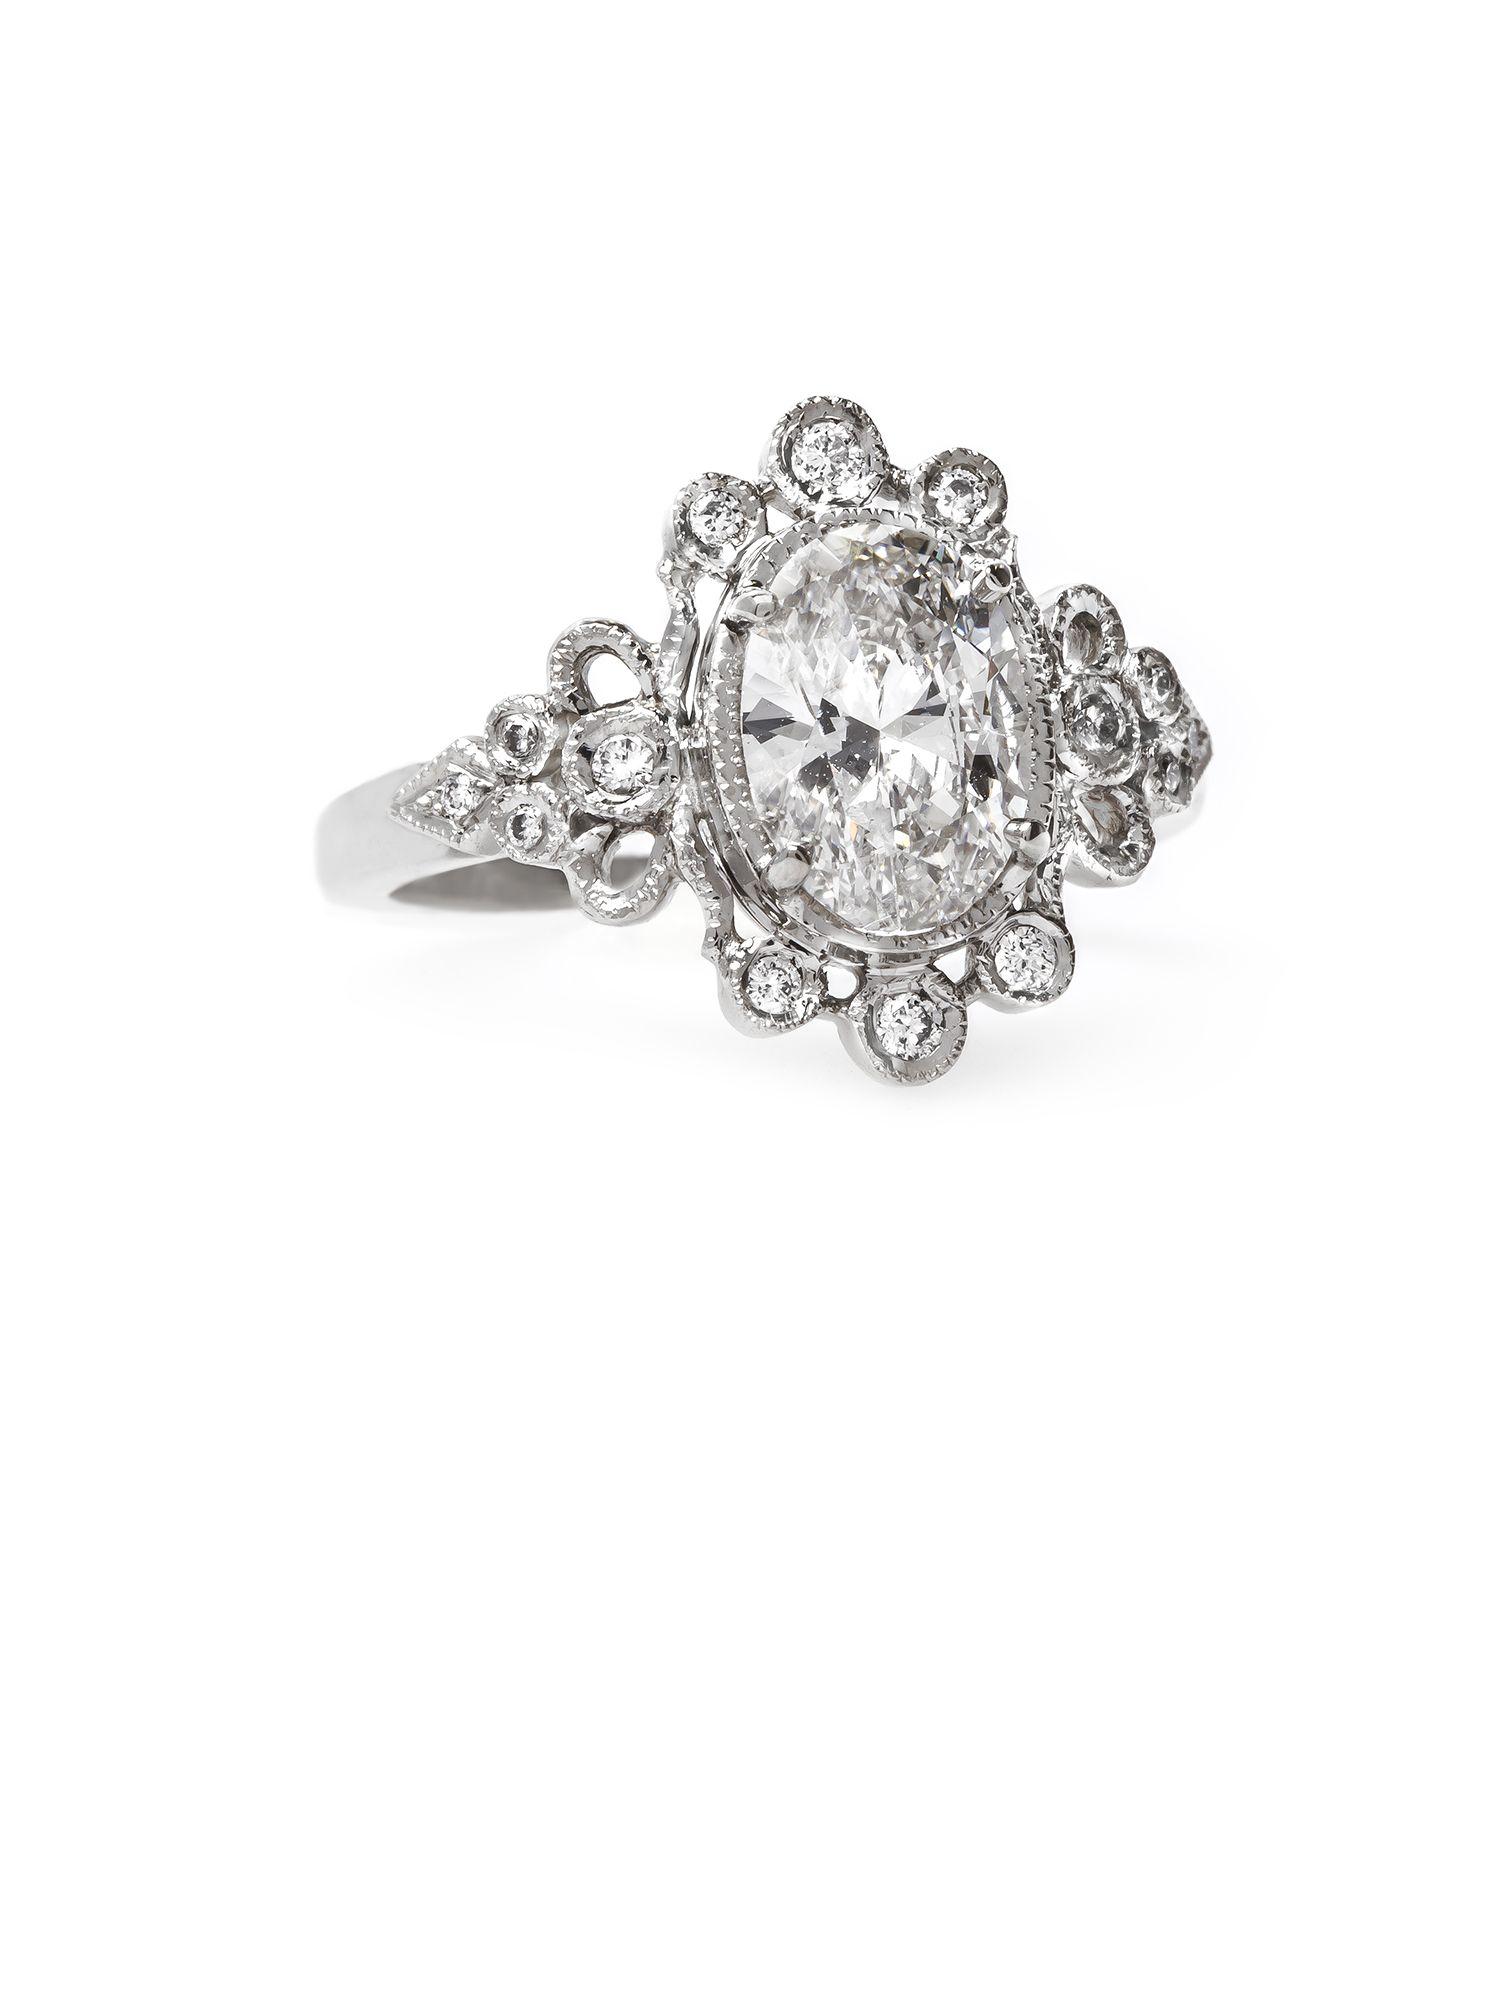 Gorgeous Vintage Engagement ring from @BridalPulse Wedding Ring ...